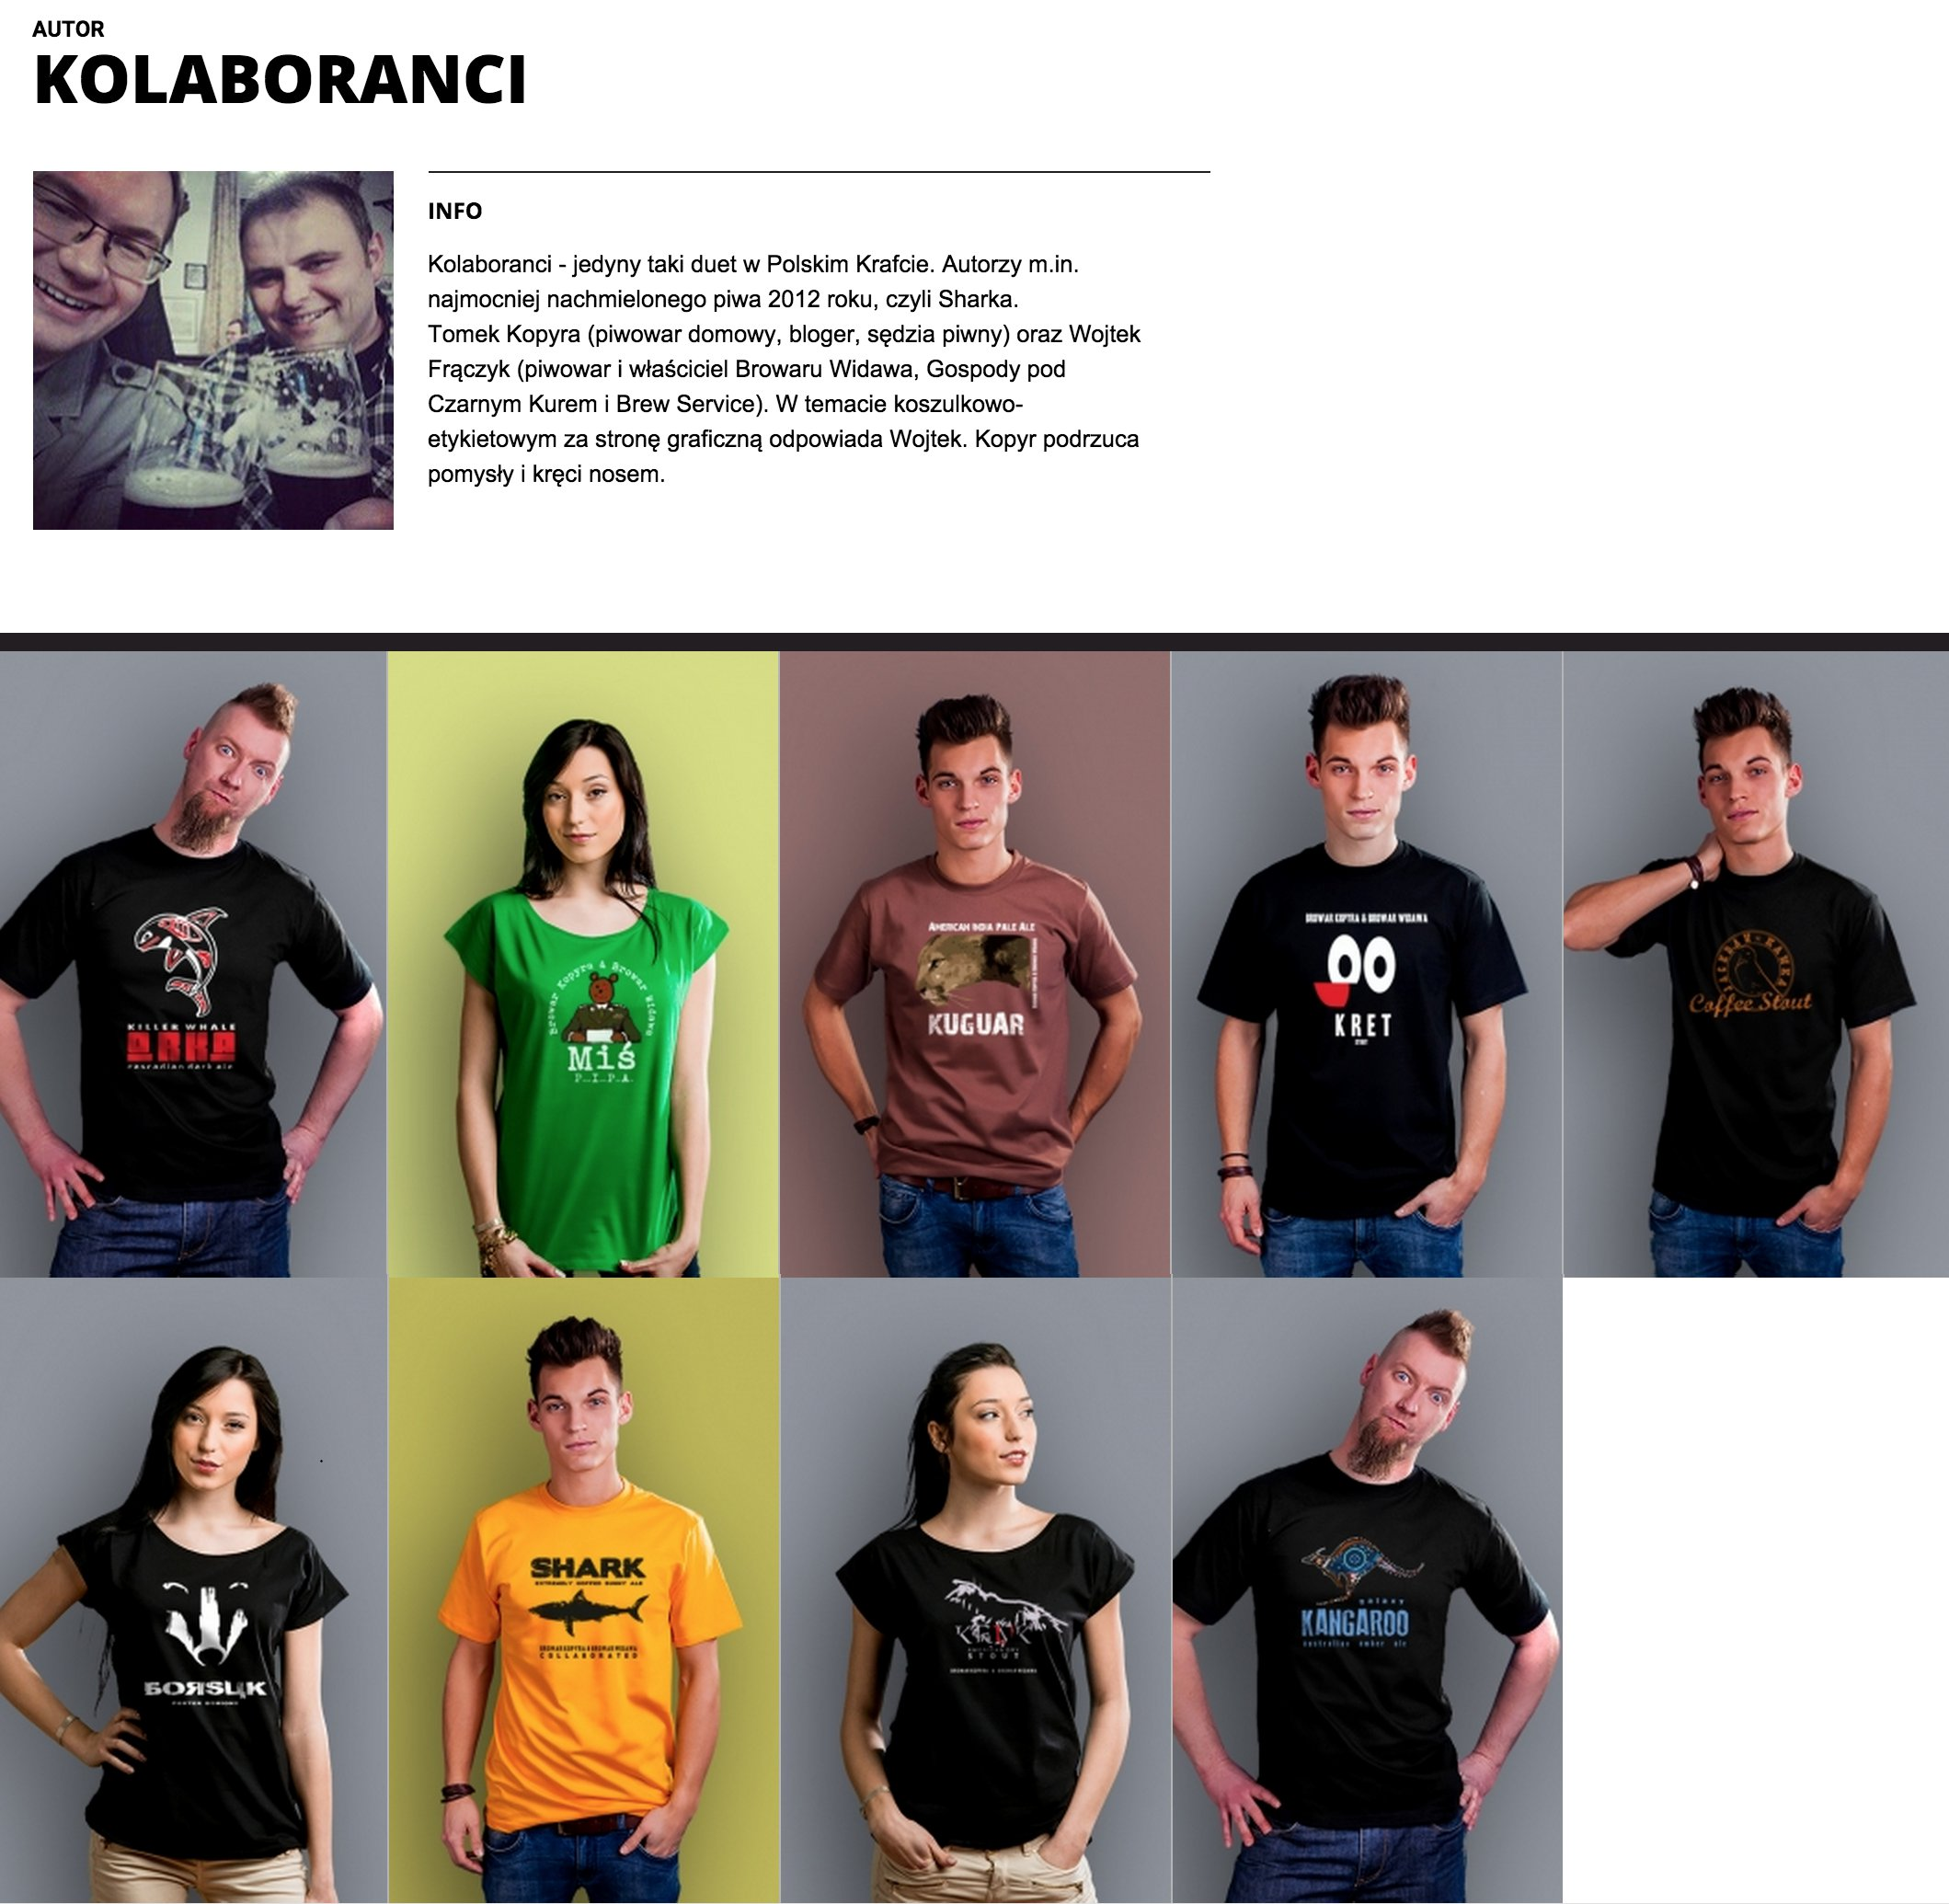 kolaboranci koszulki